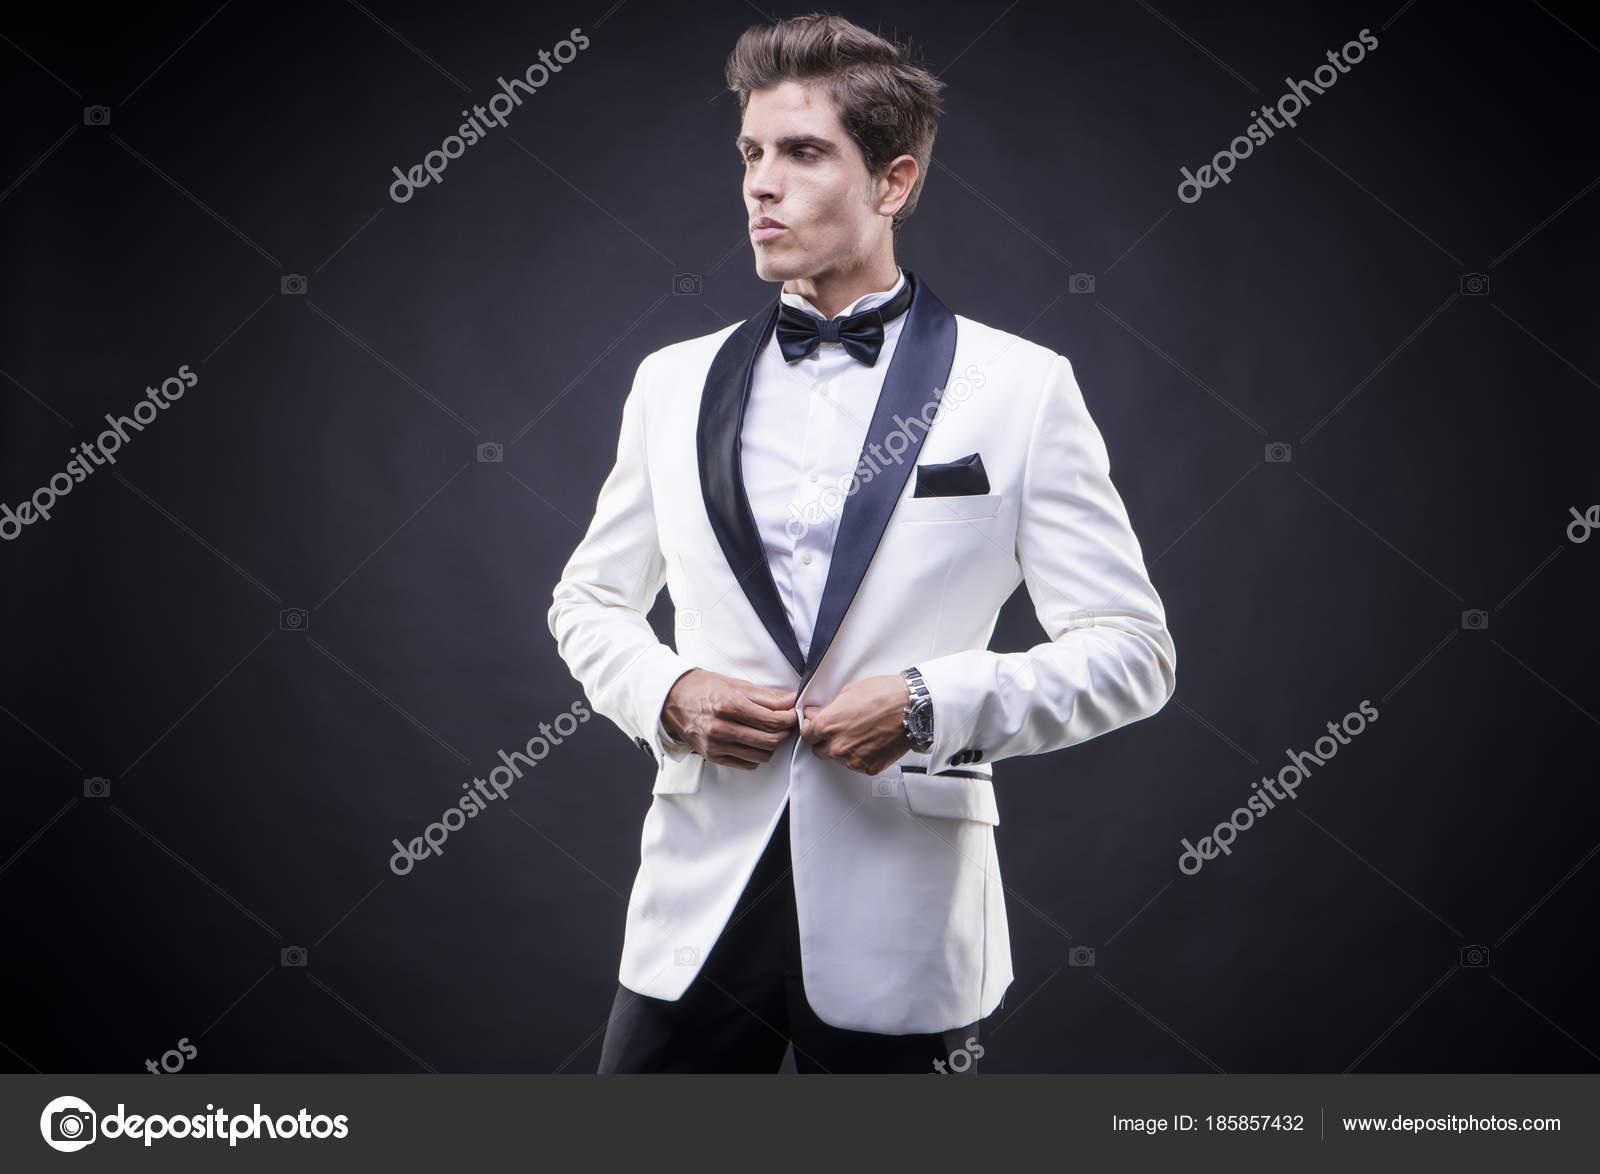 Matrimonio Elegante Uomo : Fotografie vestito smoking matrimonio elegante uomo bello